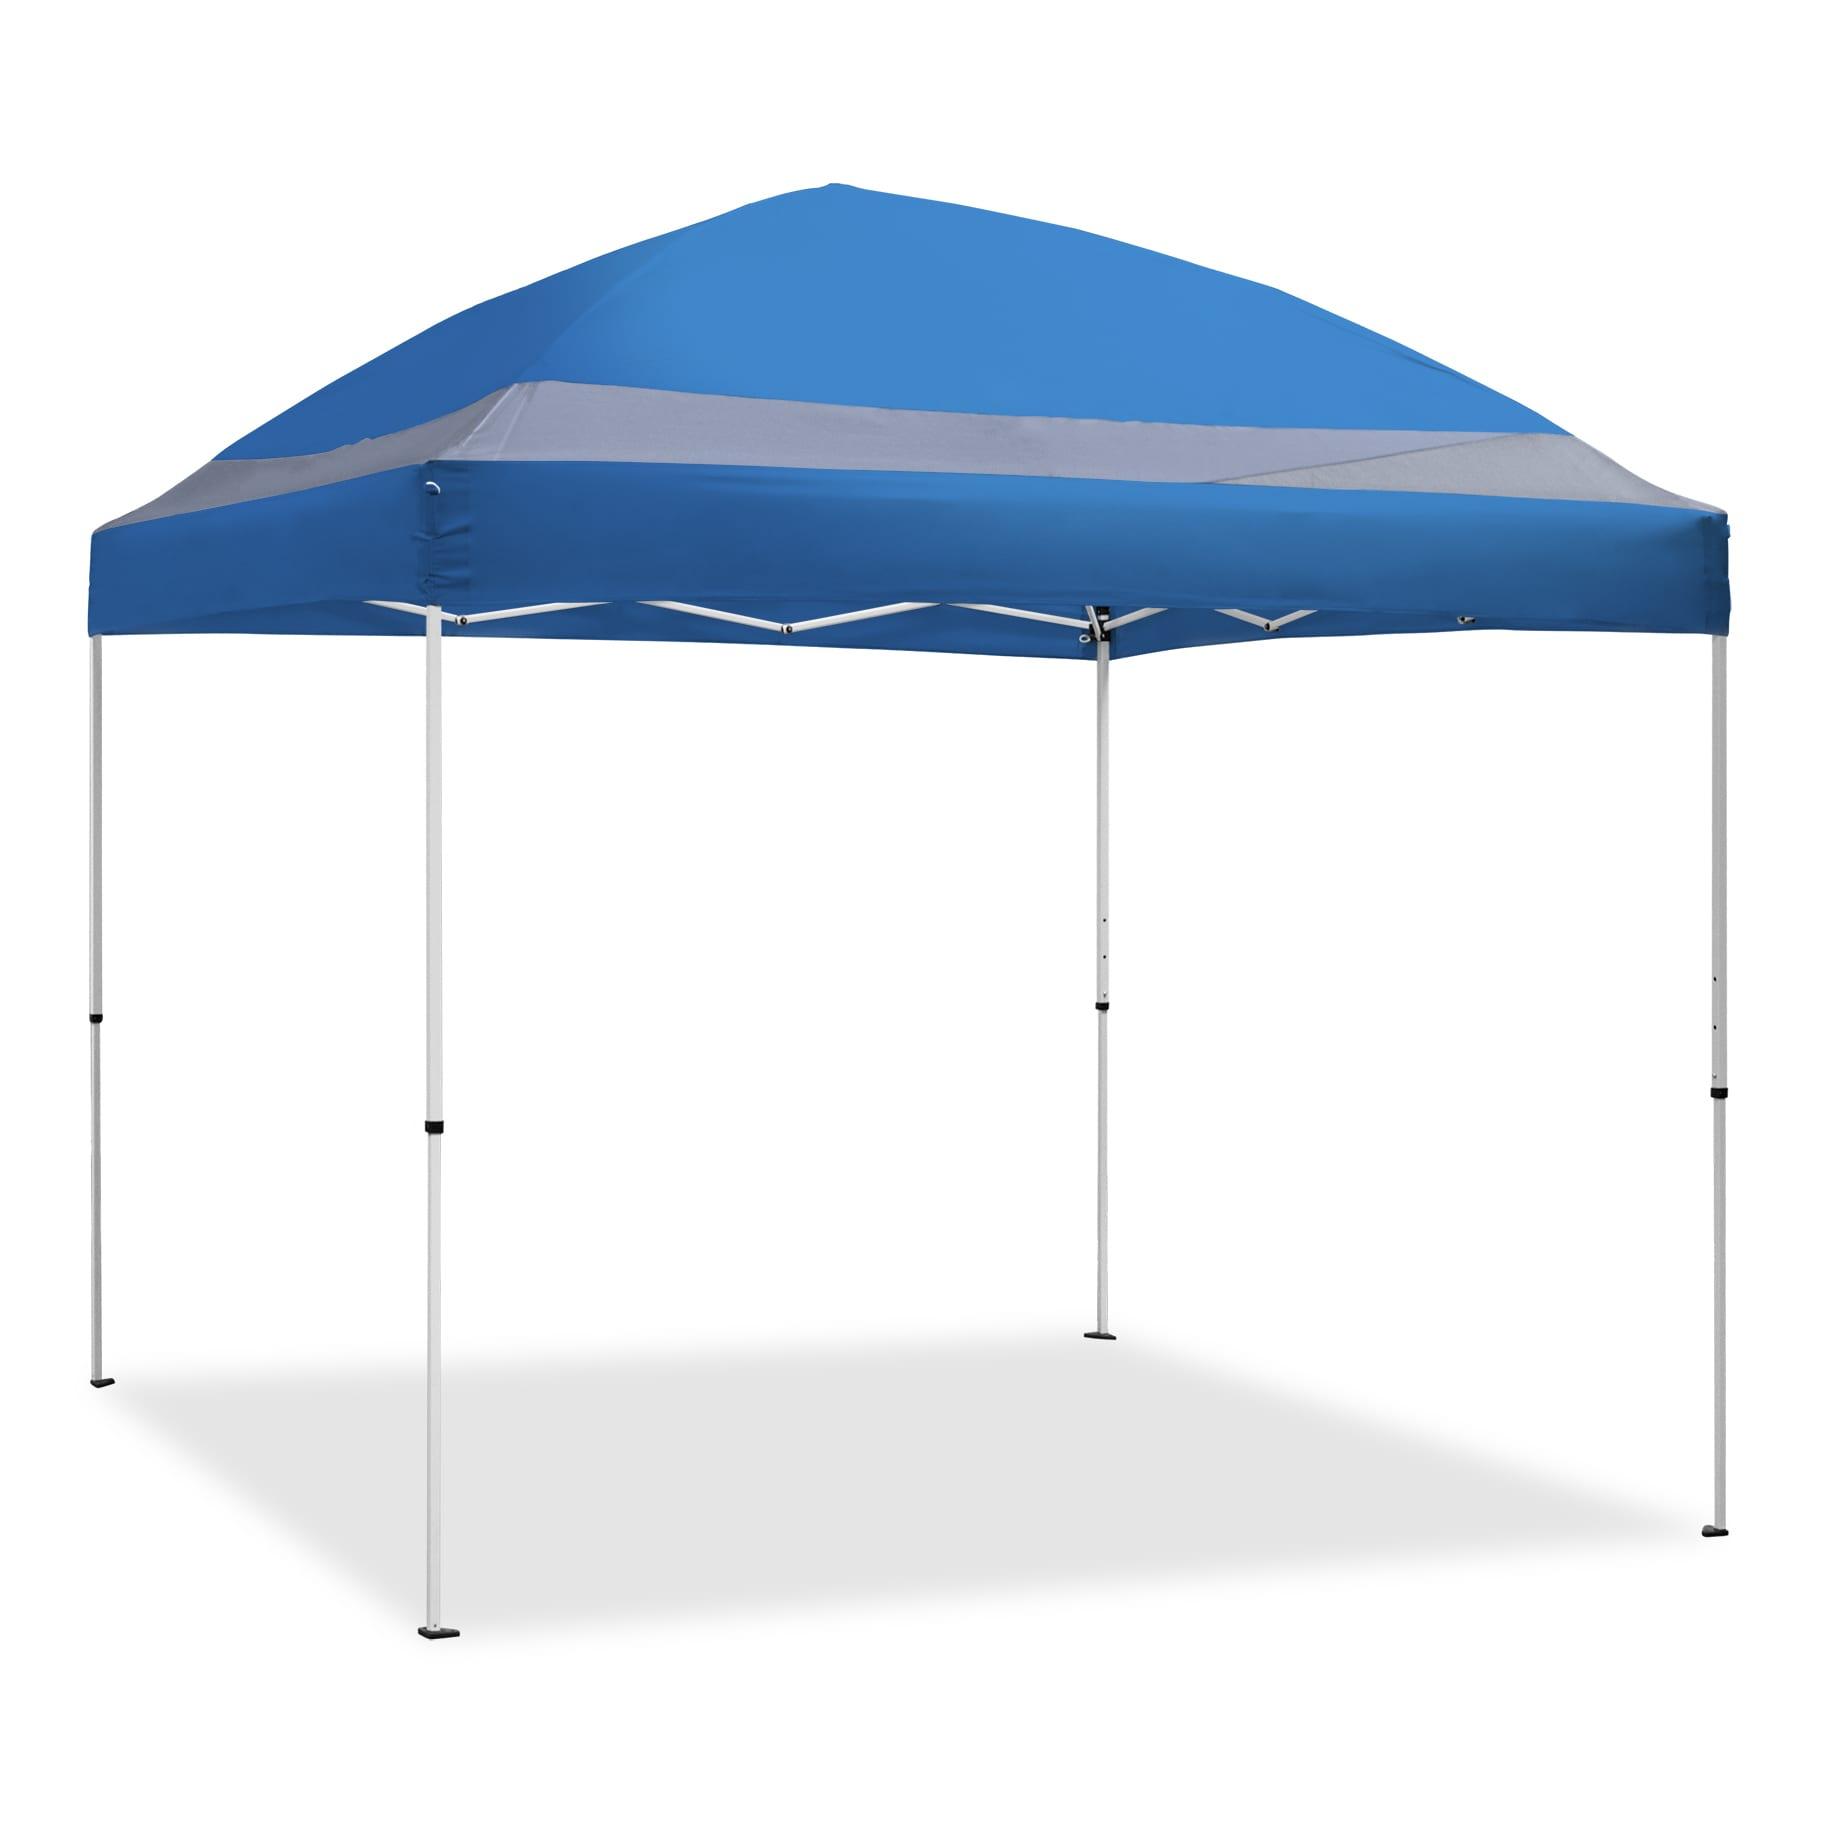 Caravan Canopy 10u0027 x 10u0027 ArchBreeze Instant Canopy  sc 1 st  eBay & Caravan Canopy 10u0027 x 10u0027 ArchBreeze Instant Canopy | eBay